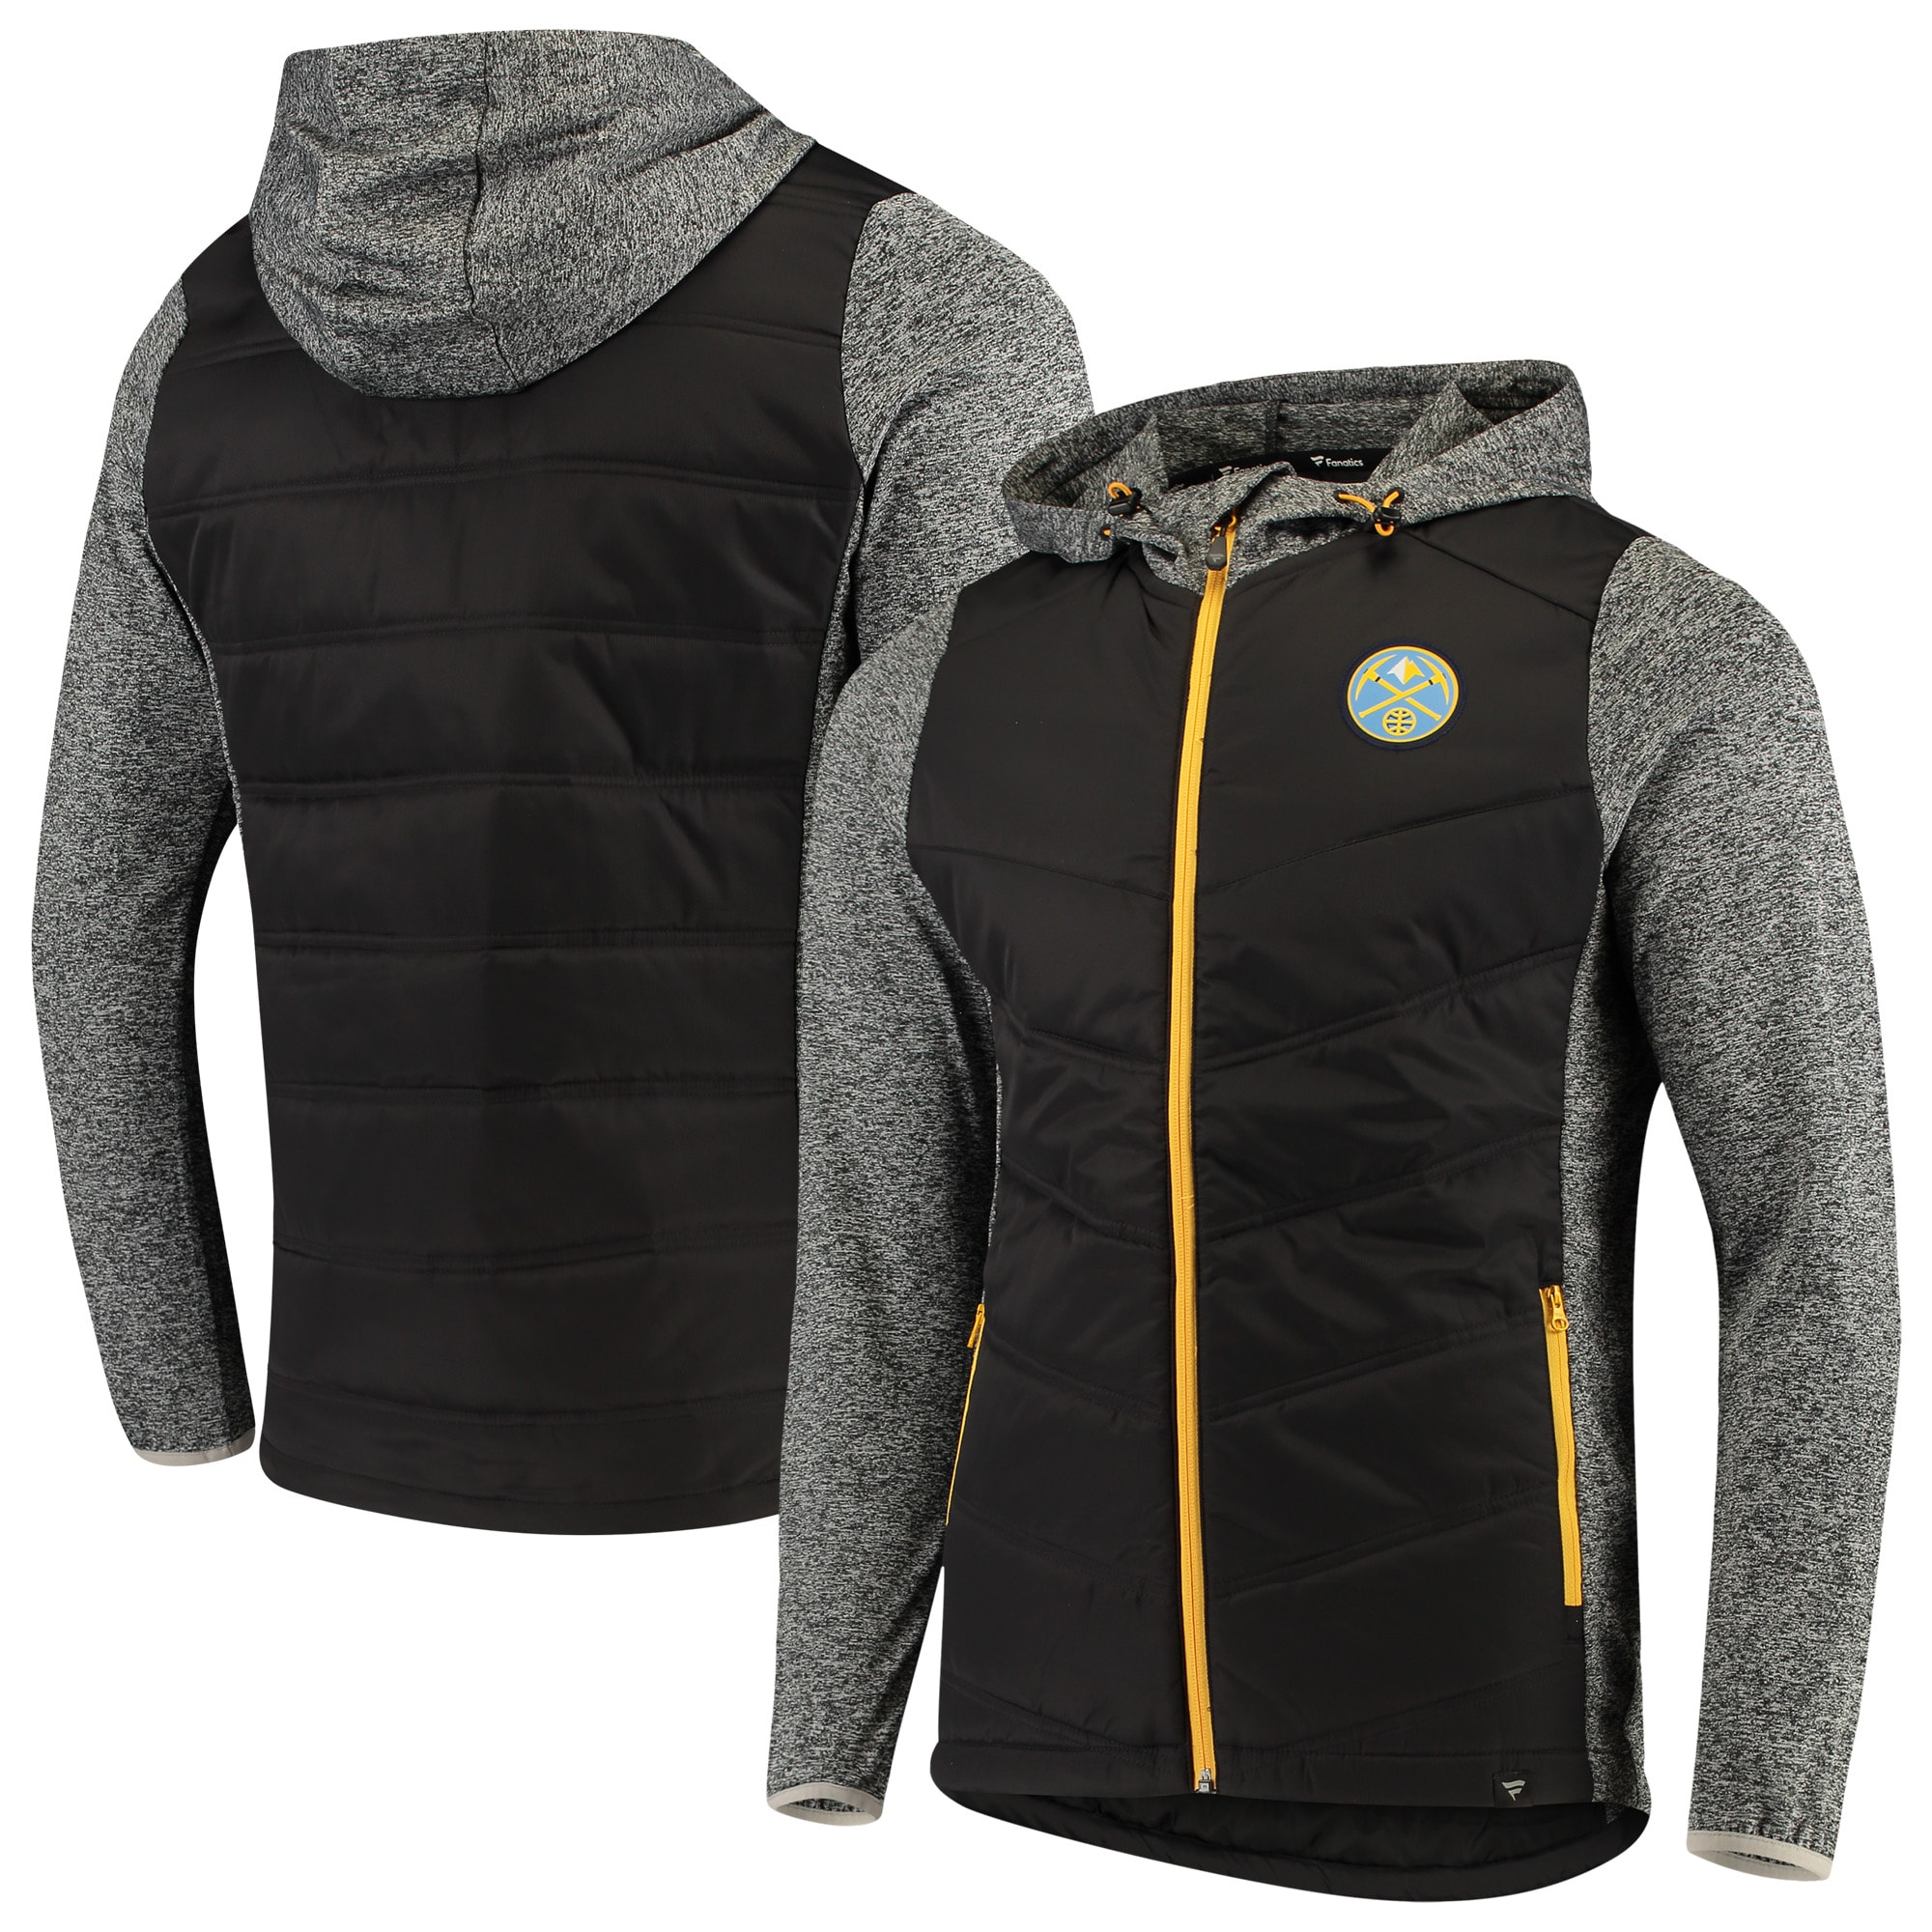 Denver Nuggets Fanatics Branded Static Insulated Full-Zip Jacket - Black/Heathered Gray